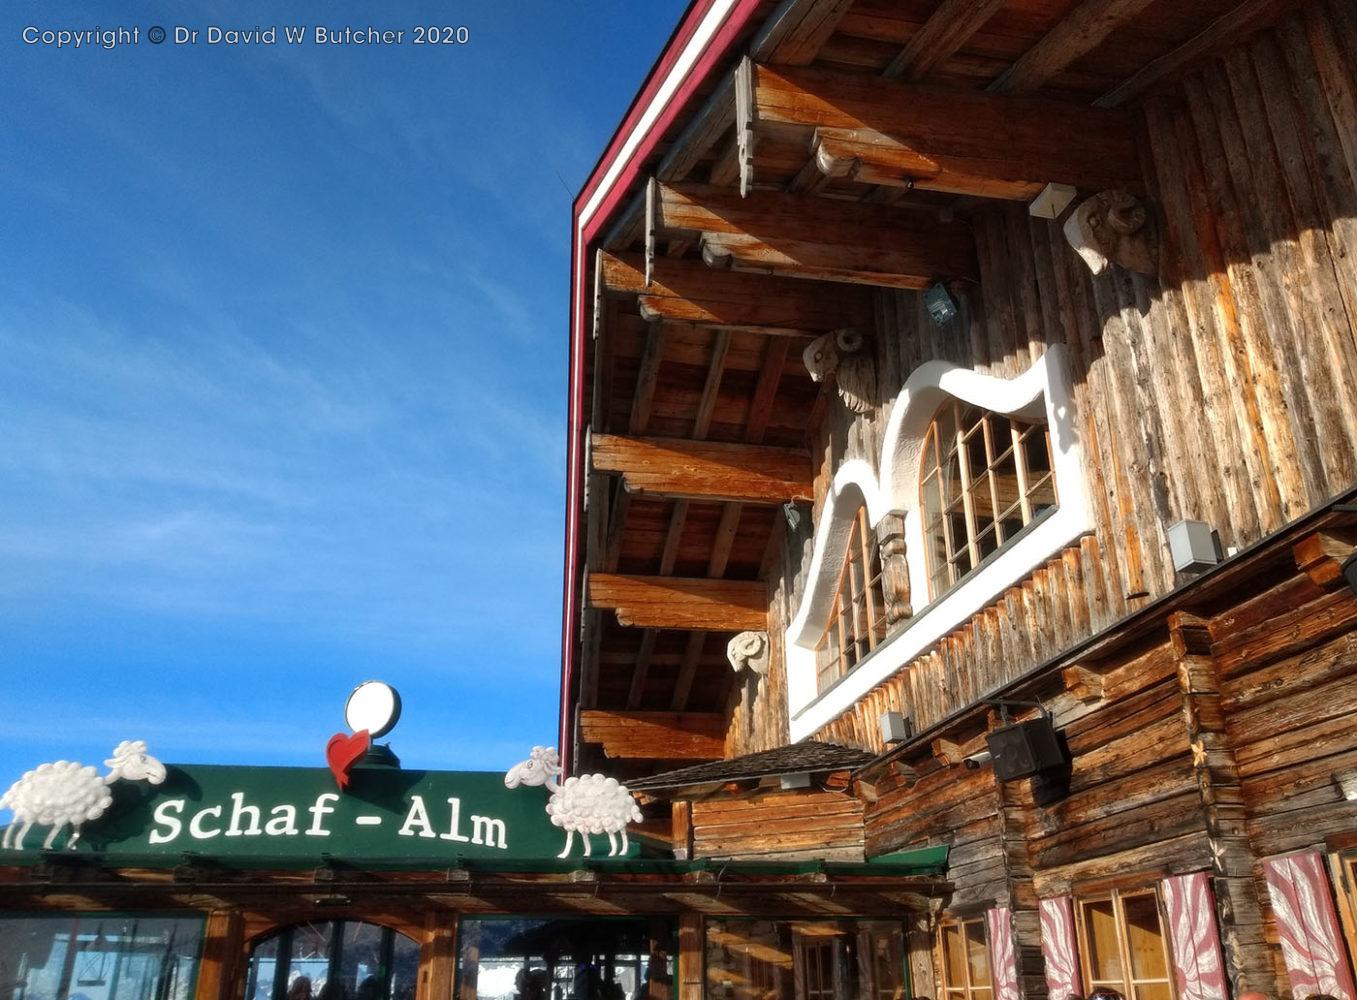 Schladming Planai Schaf-Alm at Top Station